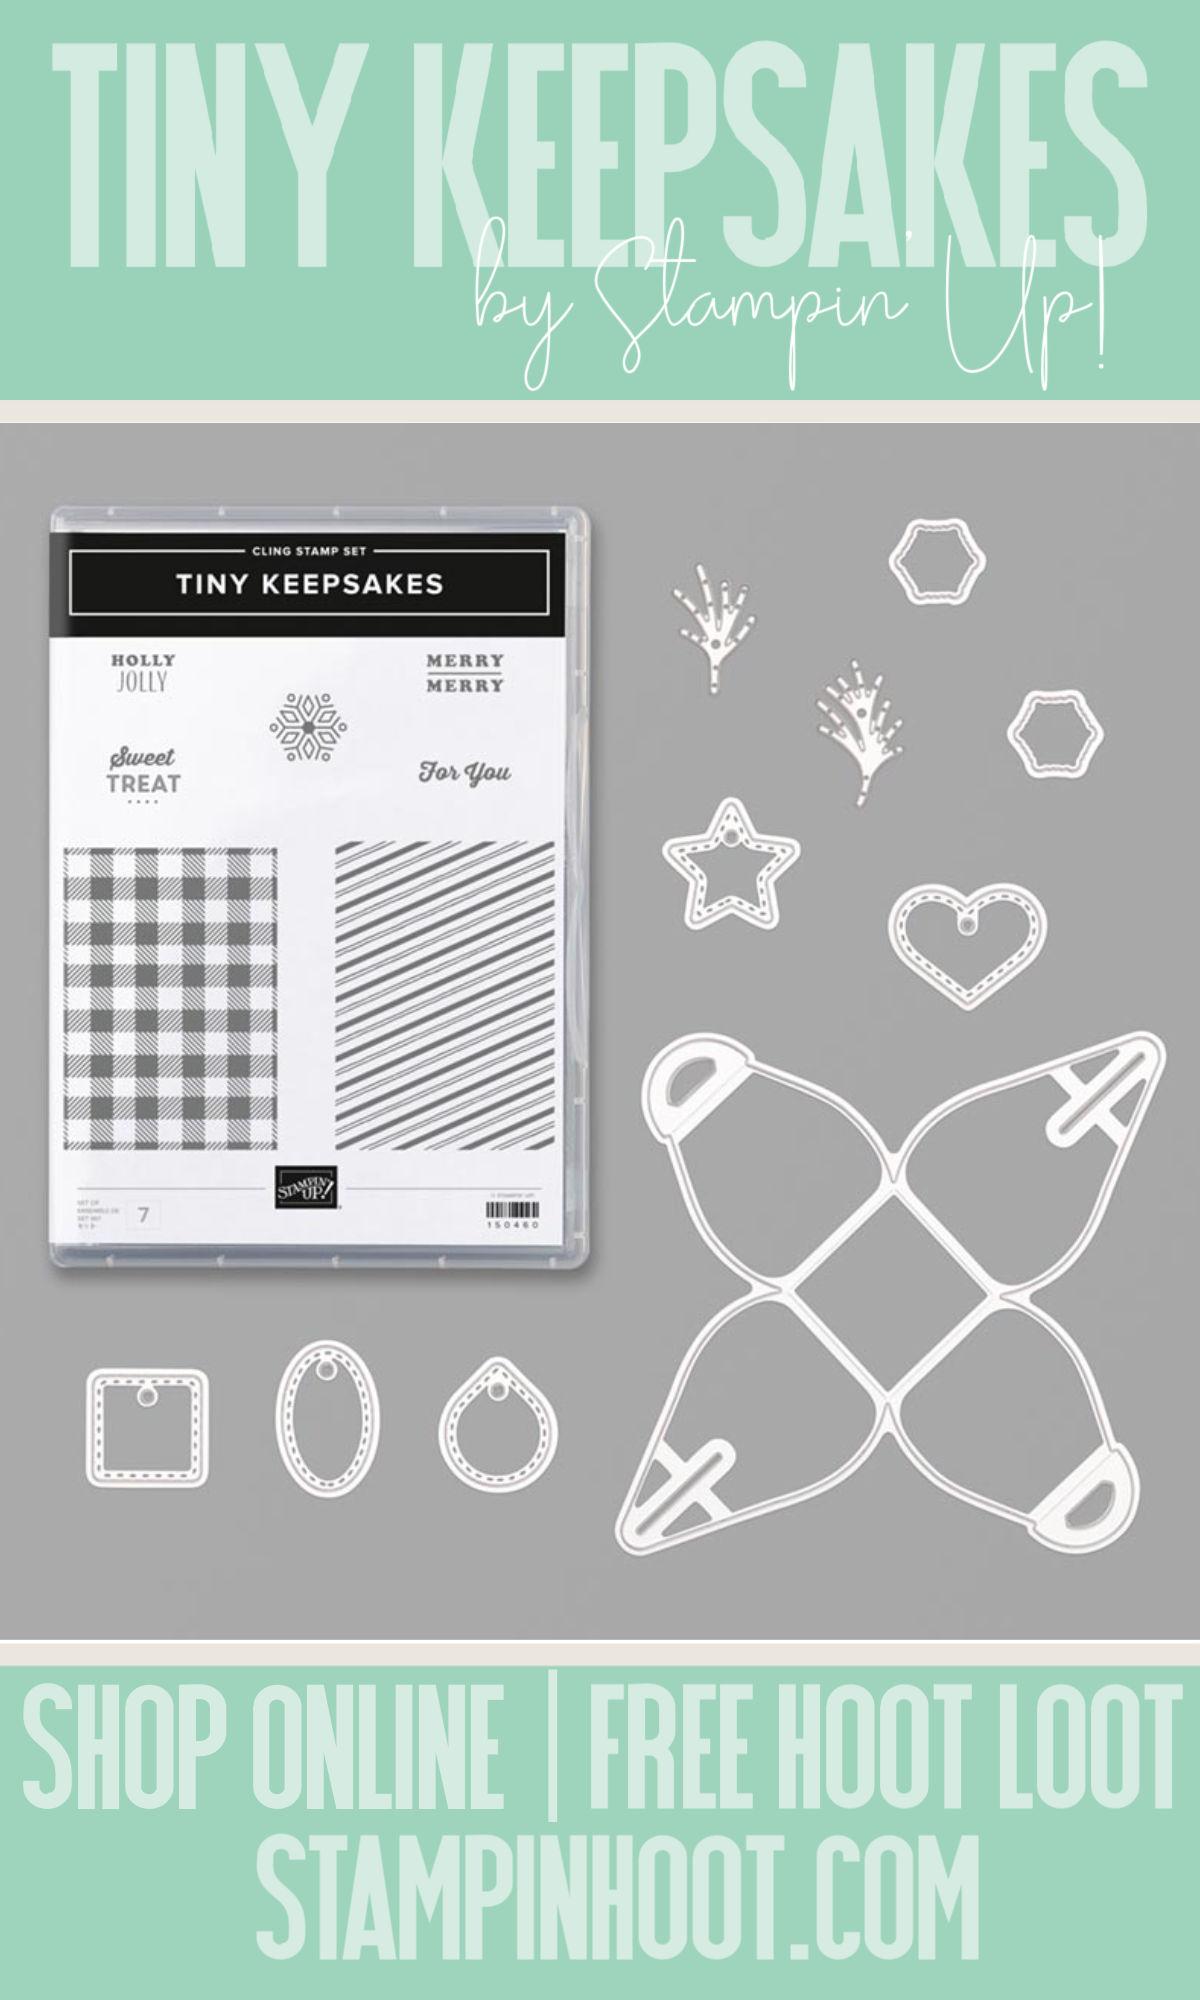 Stampin' Up! Tiny Keepsakes Bundle from the 2019 Holiday Catalog